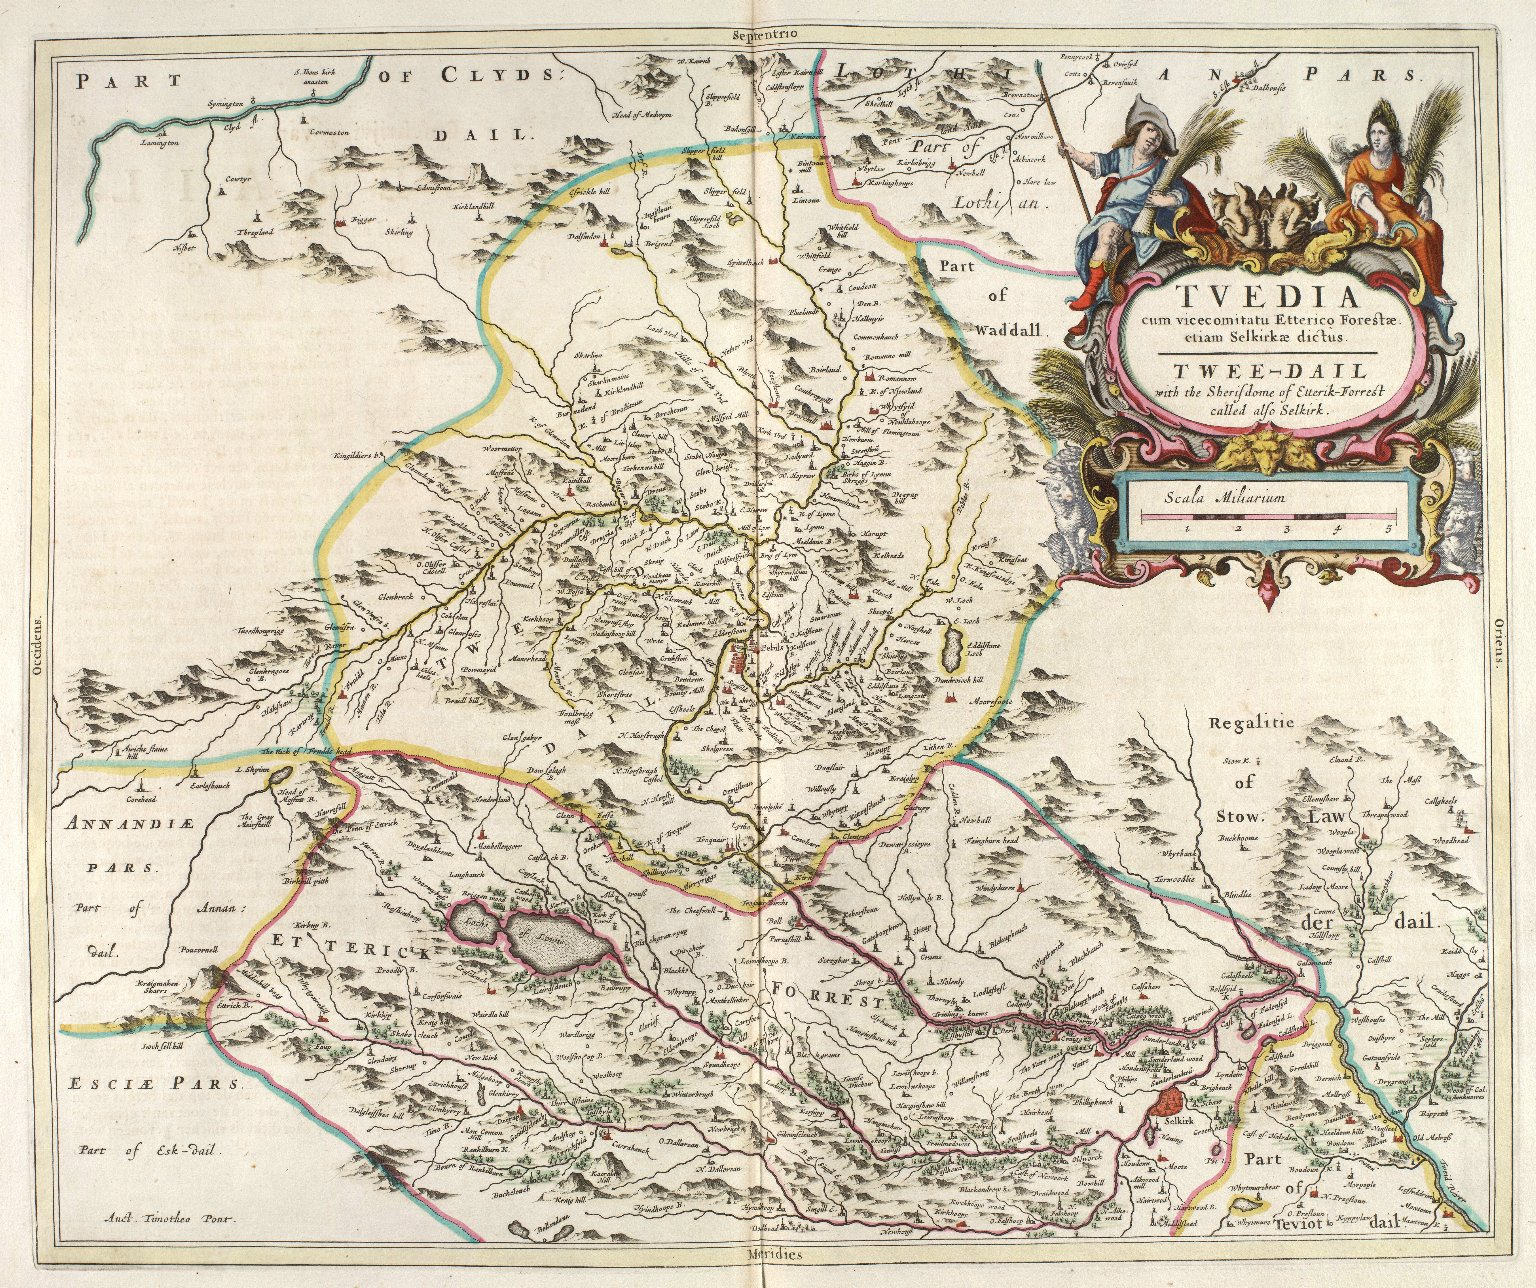 [Geographiae Blavianae] [Also known as: Atlas major] [034 of 153]